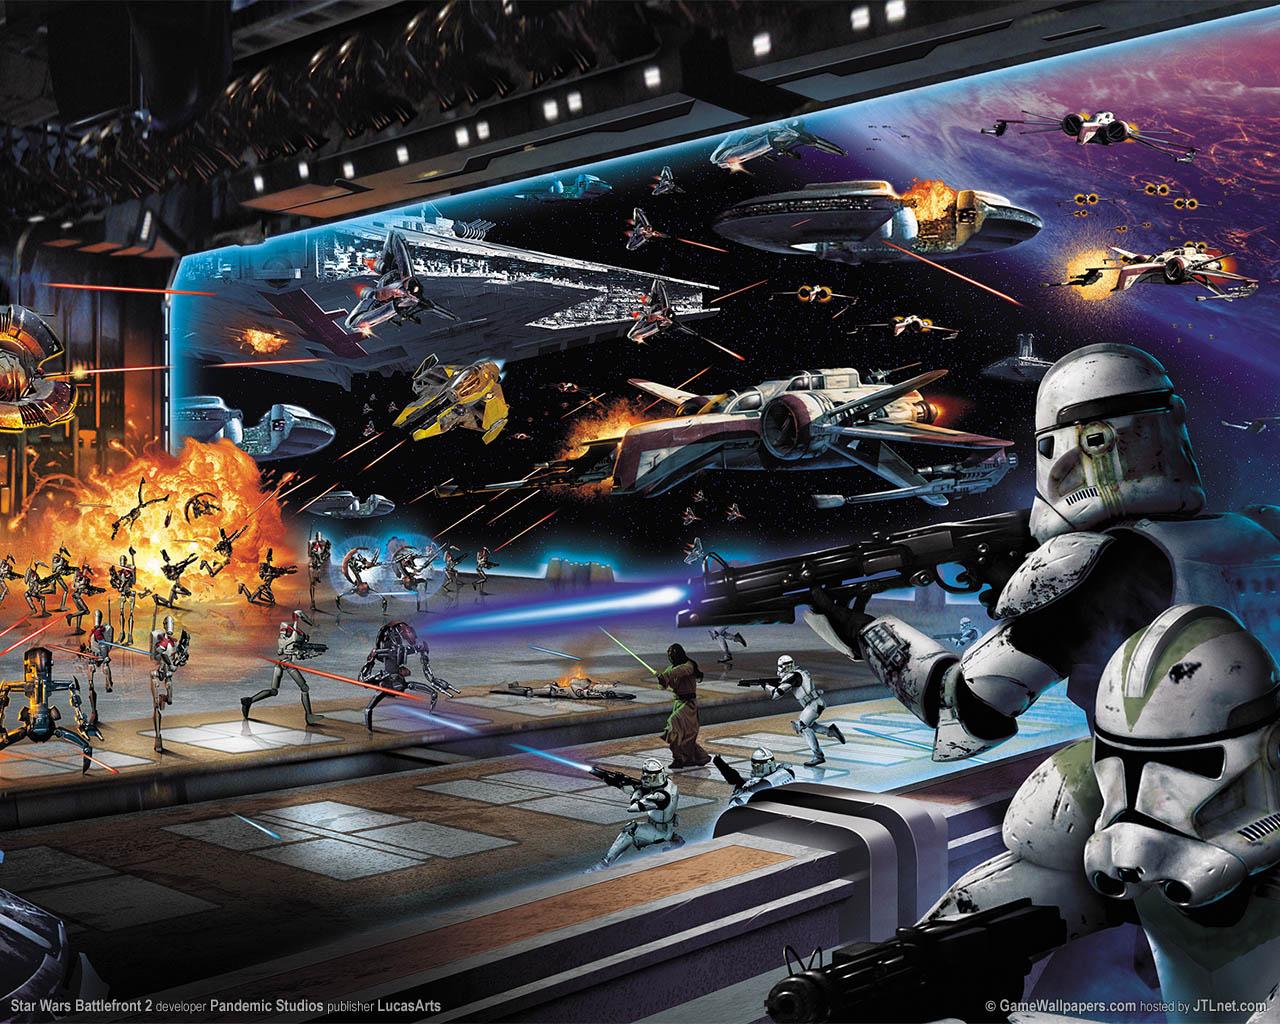 Epic Battles Pic Thread Page 8 Spacebattles Forums 1280x1024